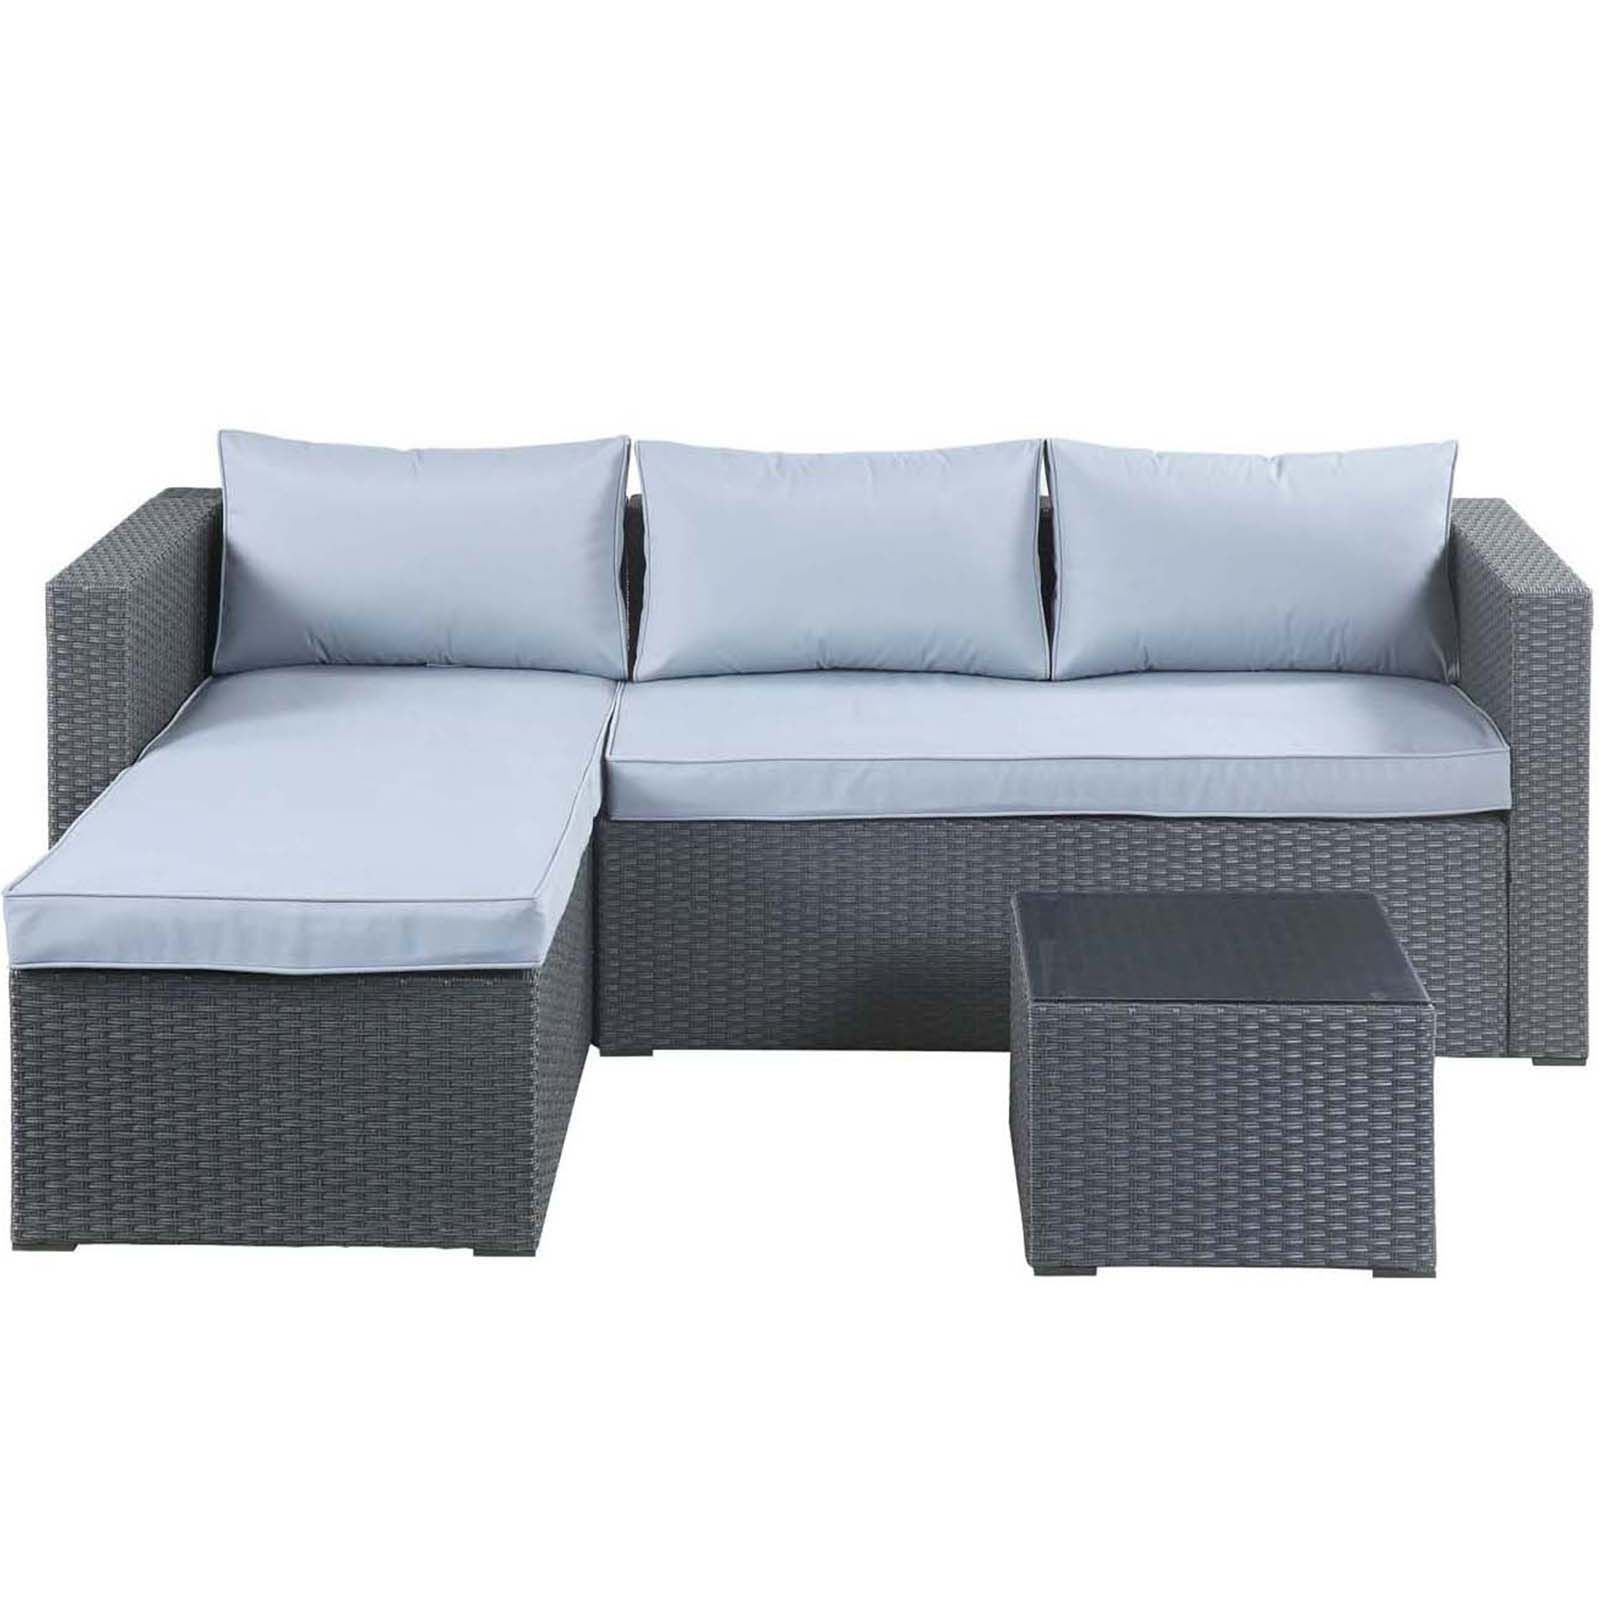 Find Alexandria Rattan Effect 3 Seater Corner Garden Sofa Set At